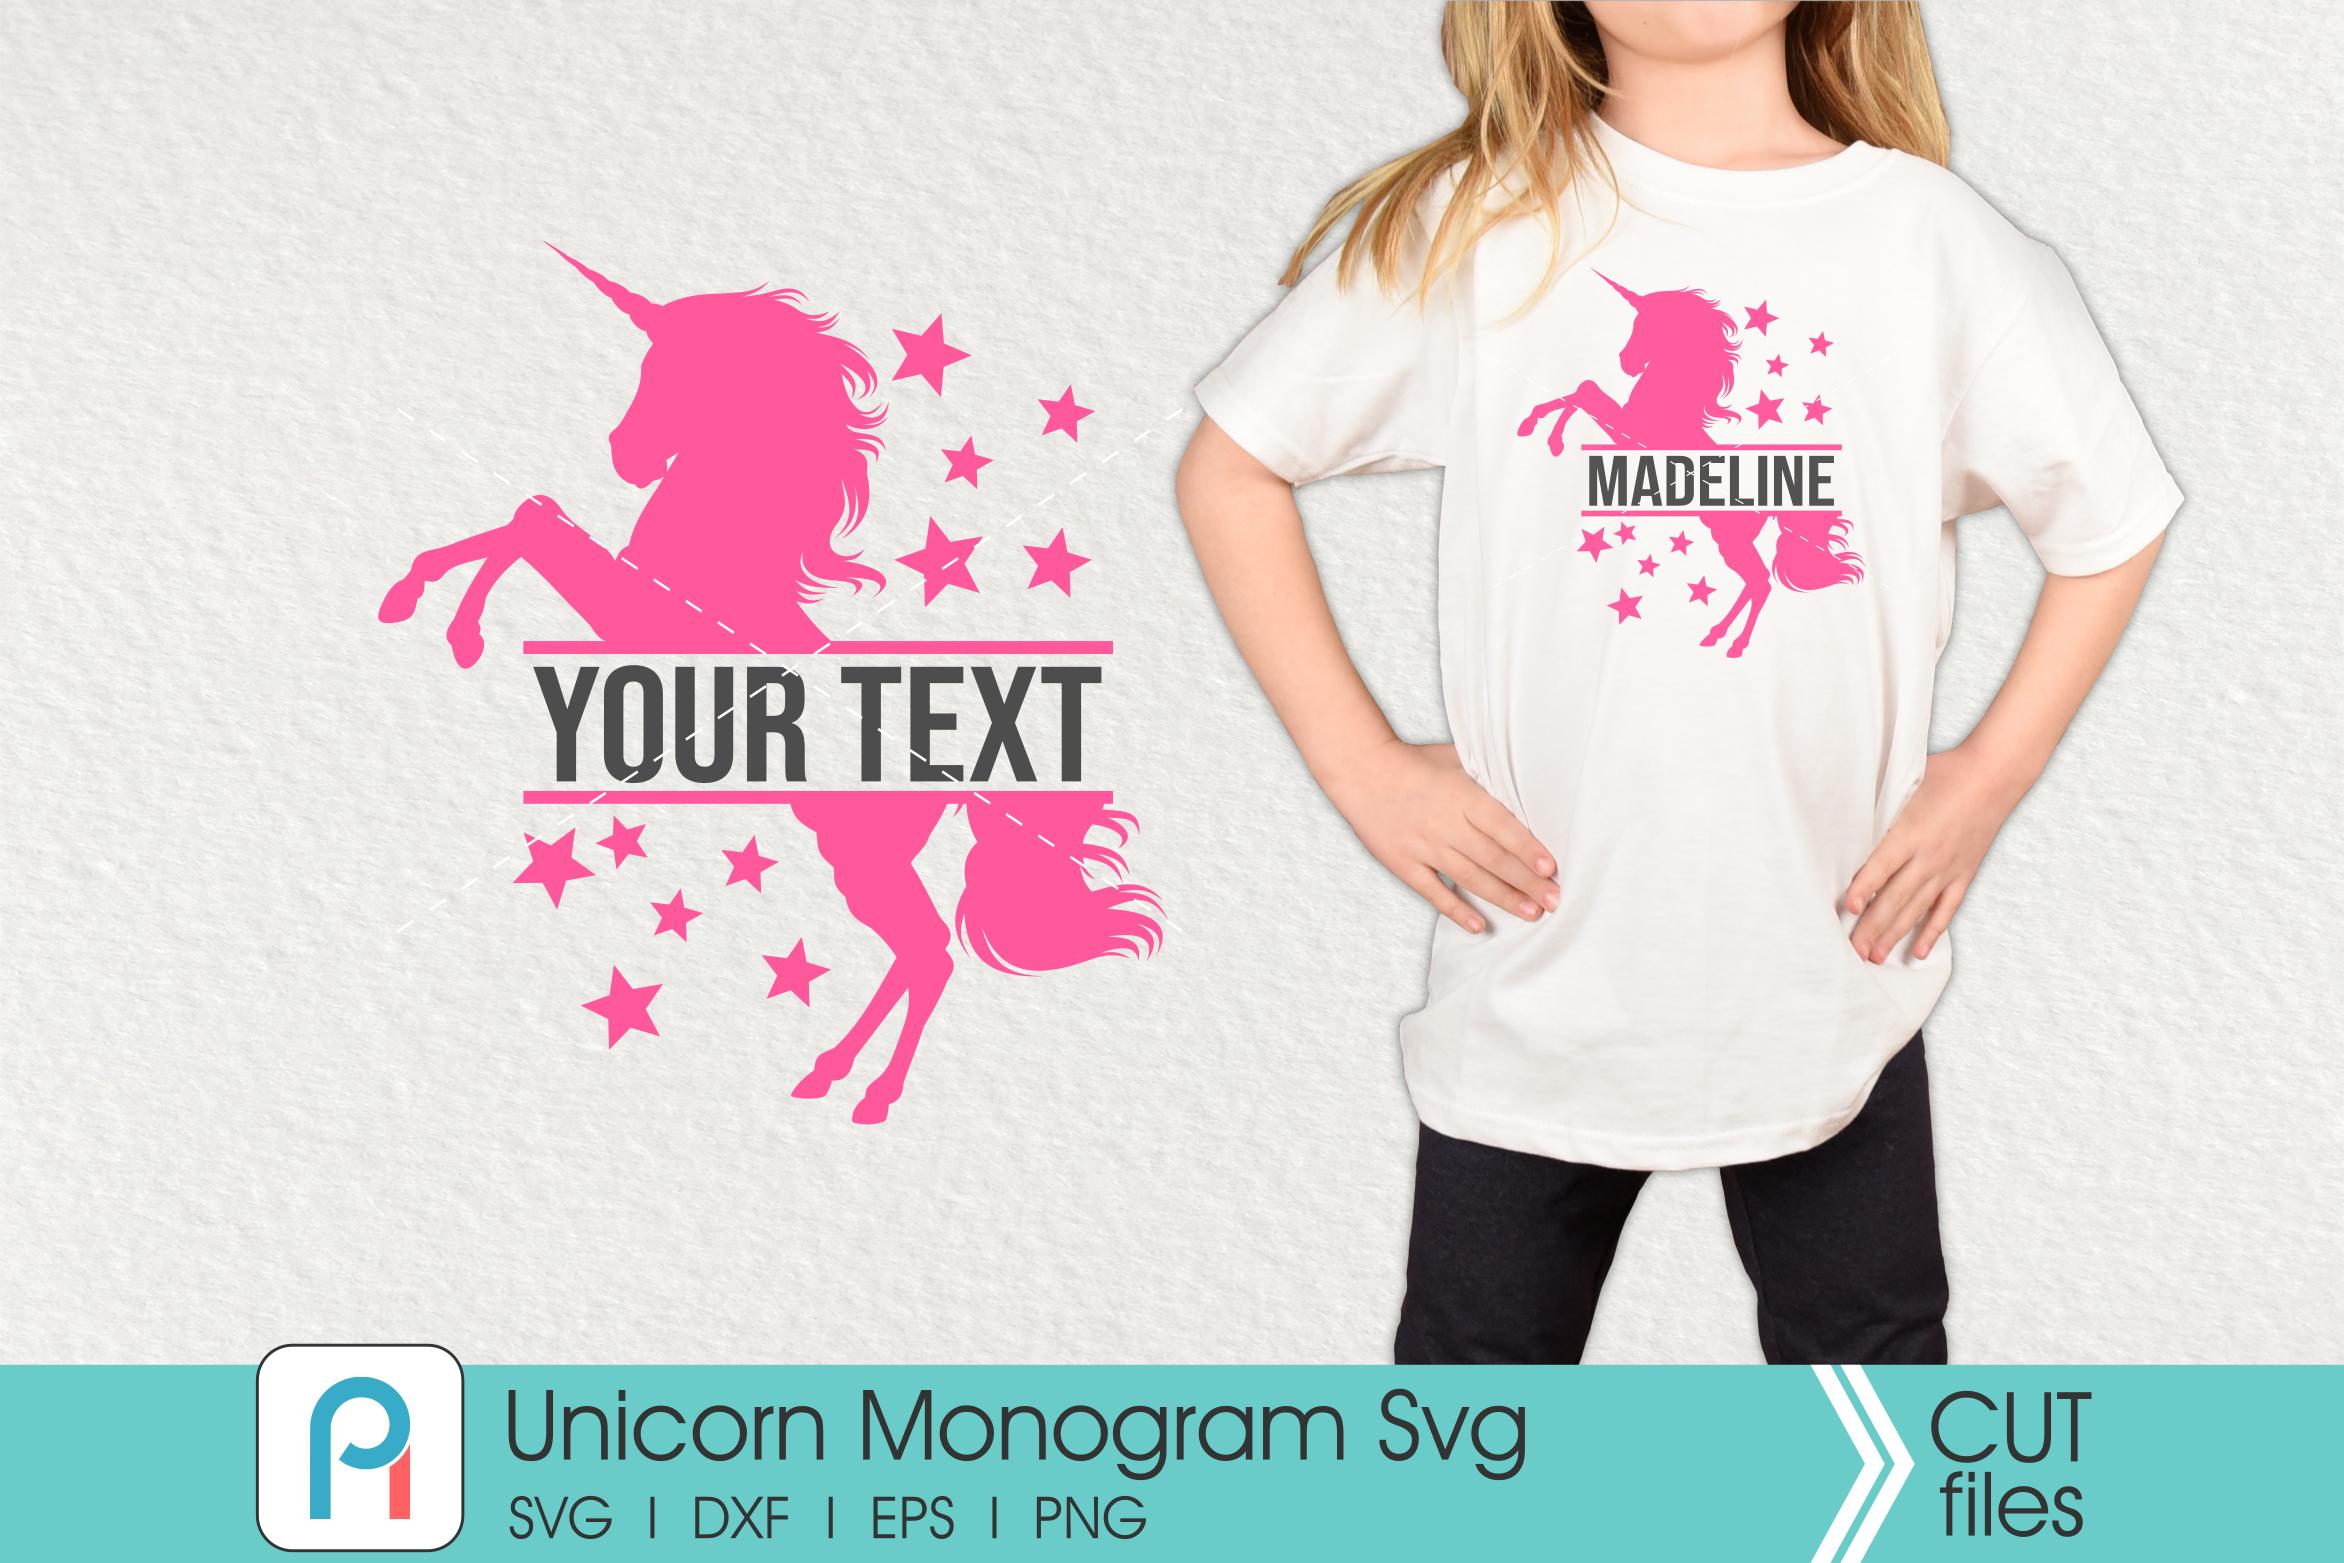 Unicorn Monogram Svg Unicorn Svg Unicorn Clip Art By Pinoyart